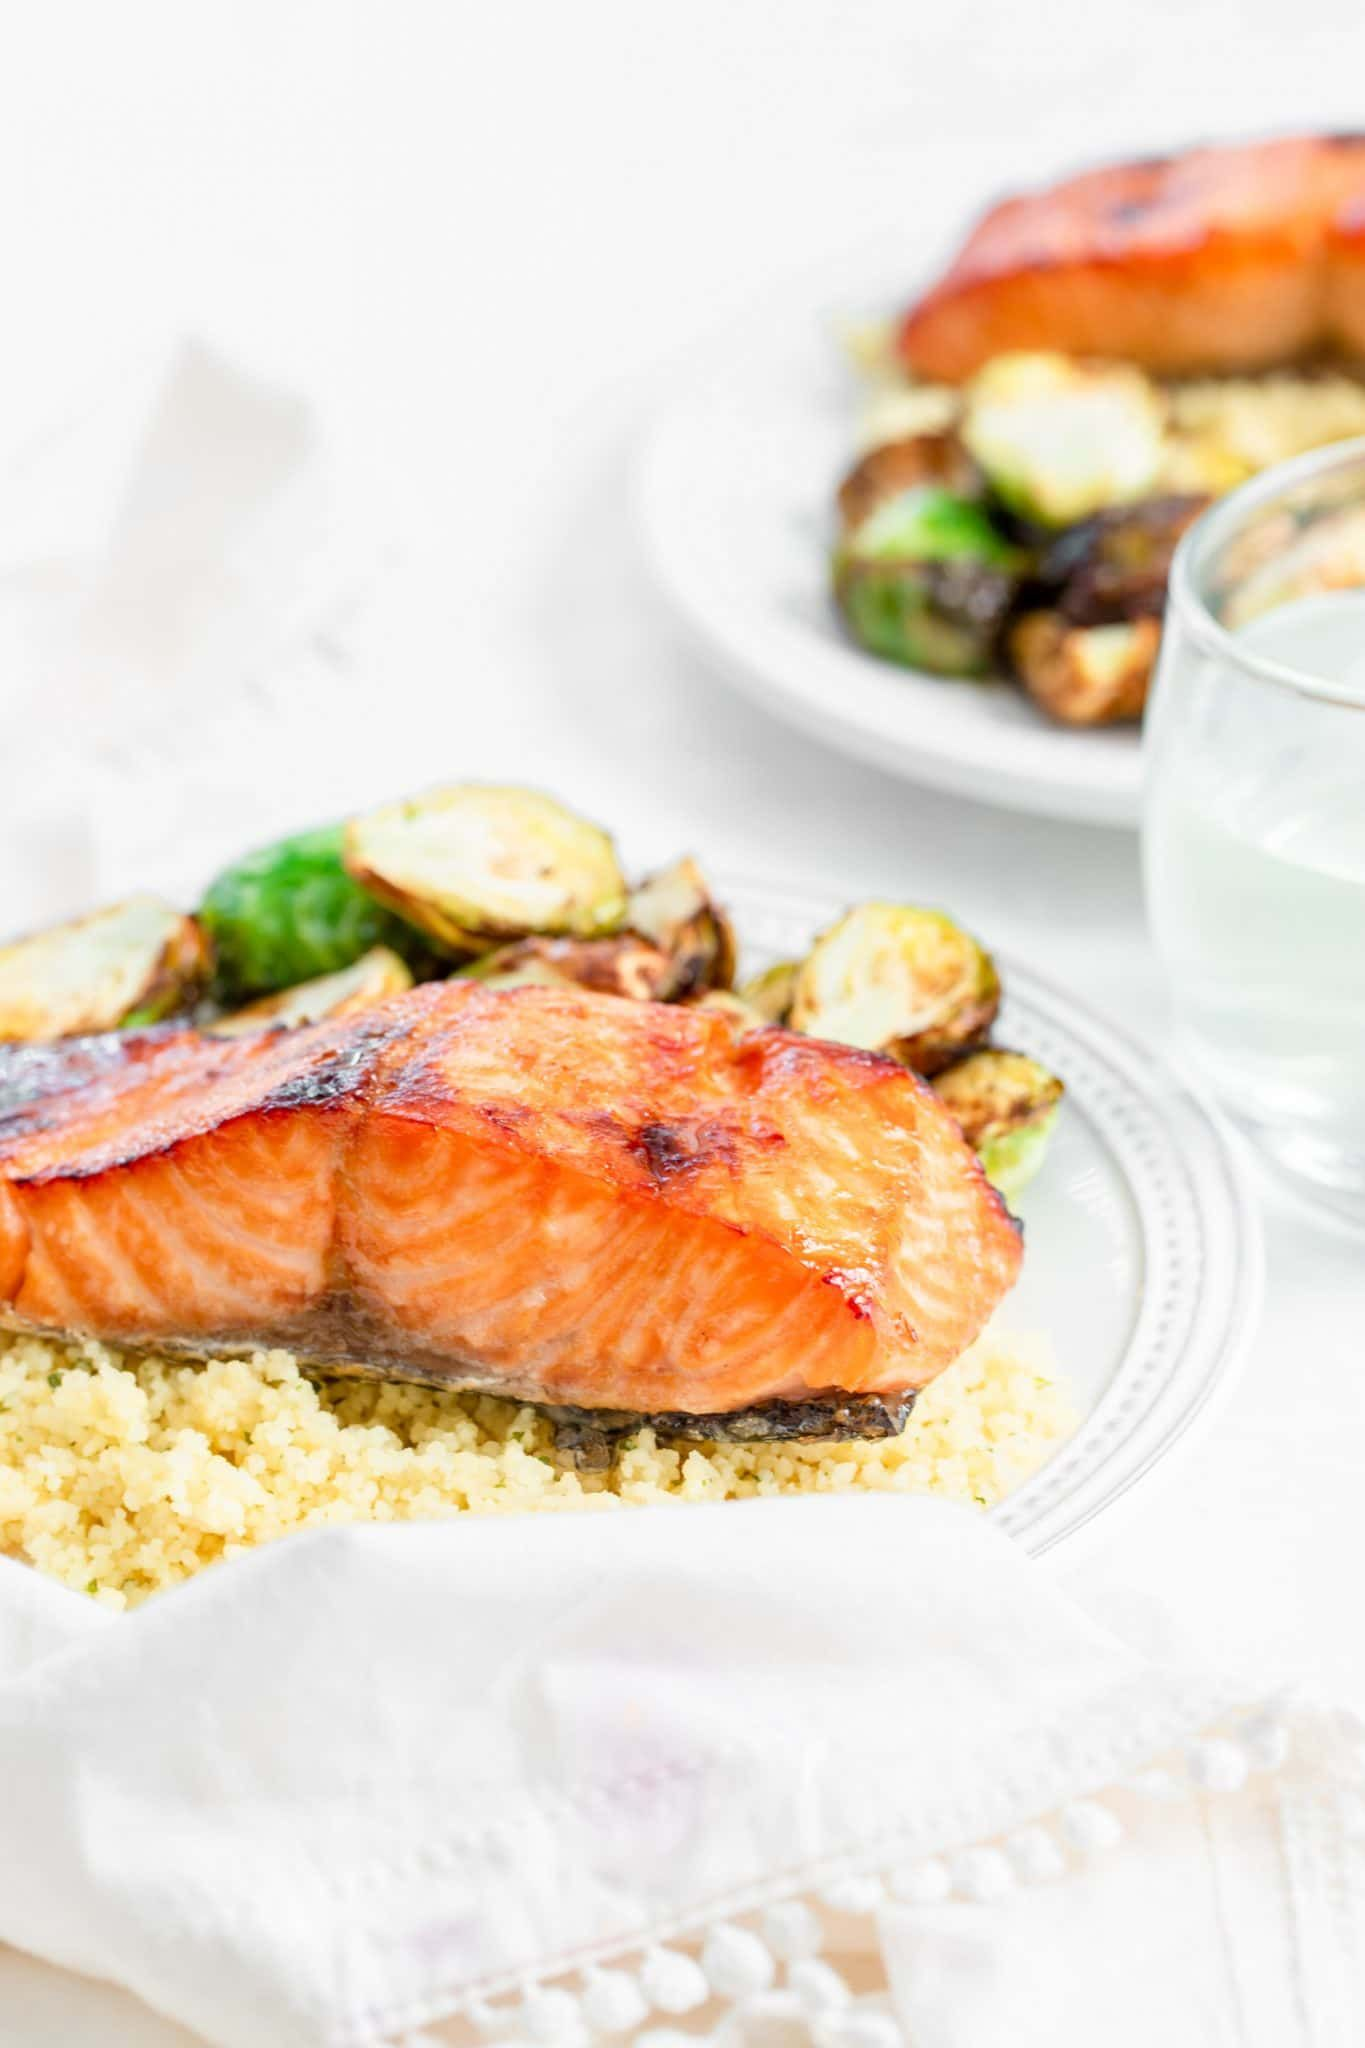 Brown Sugar & Bourbon Glazed Salmon | A Healthy Slice of Life